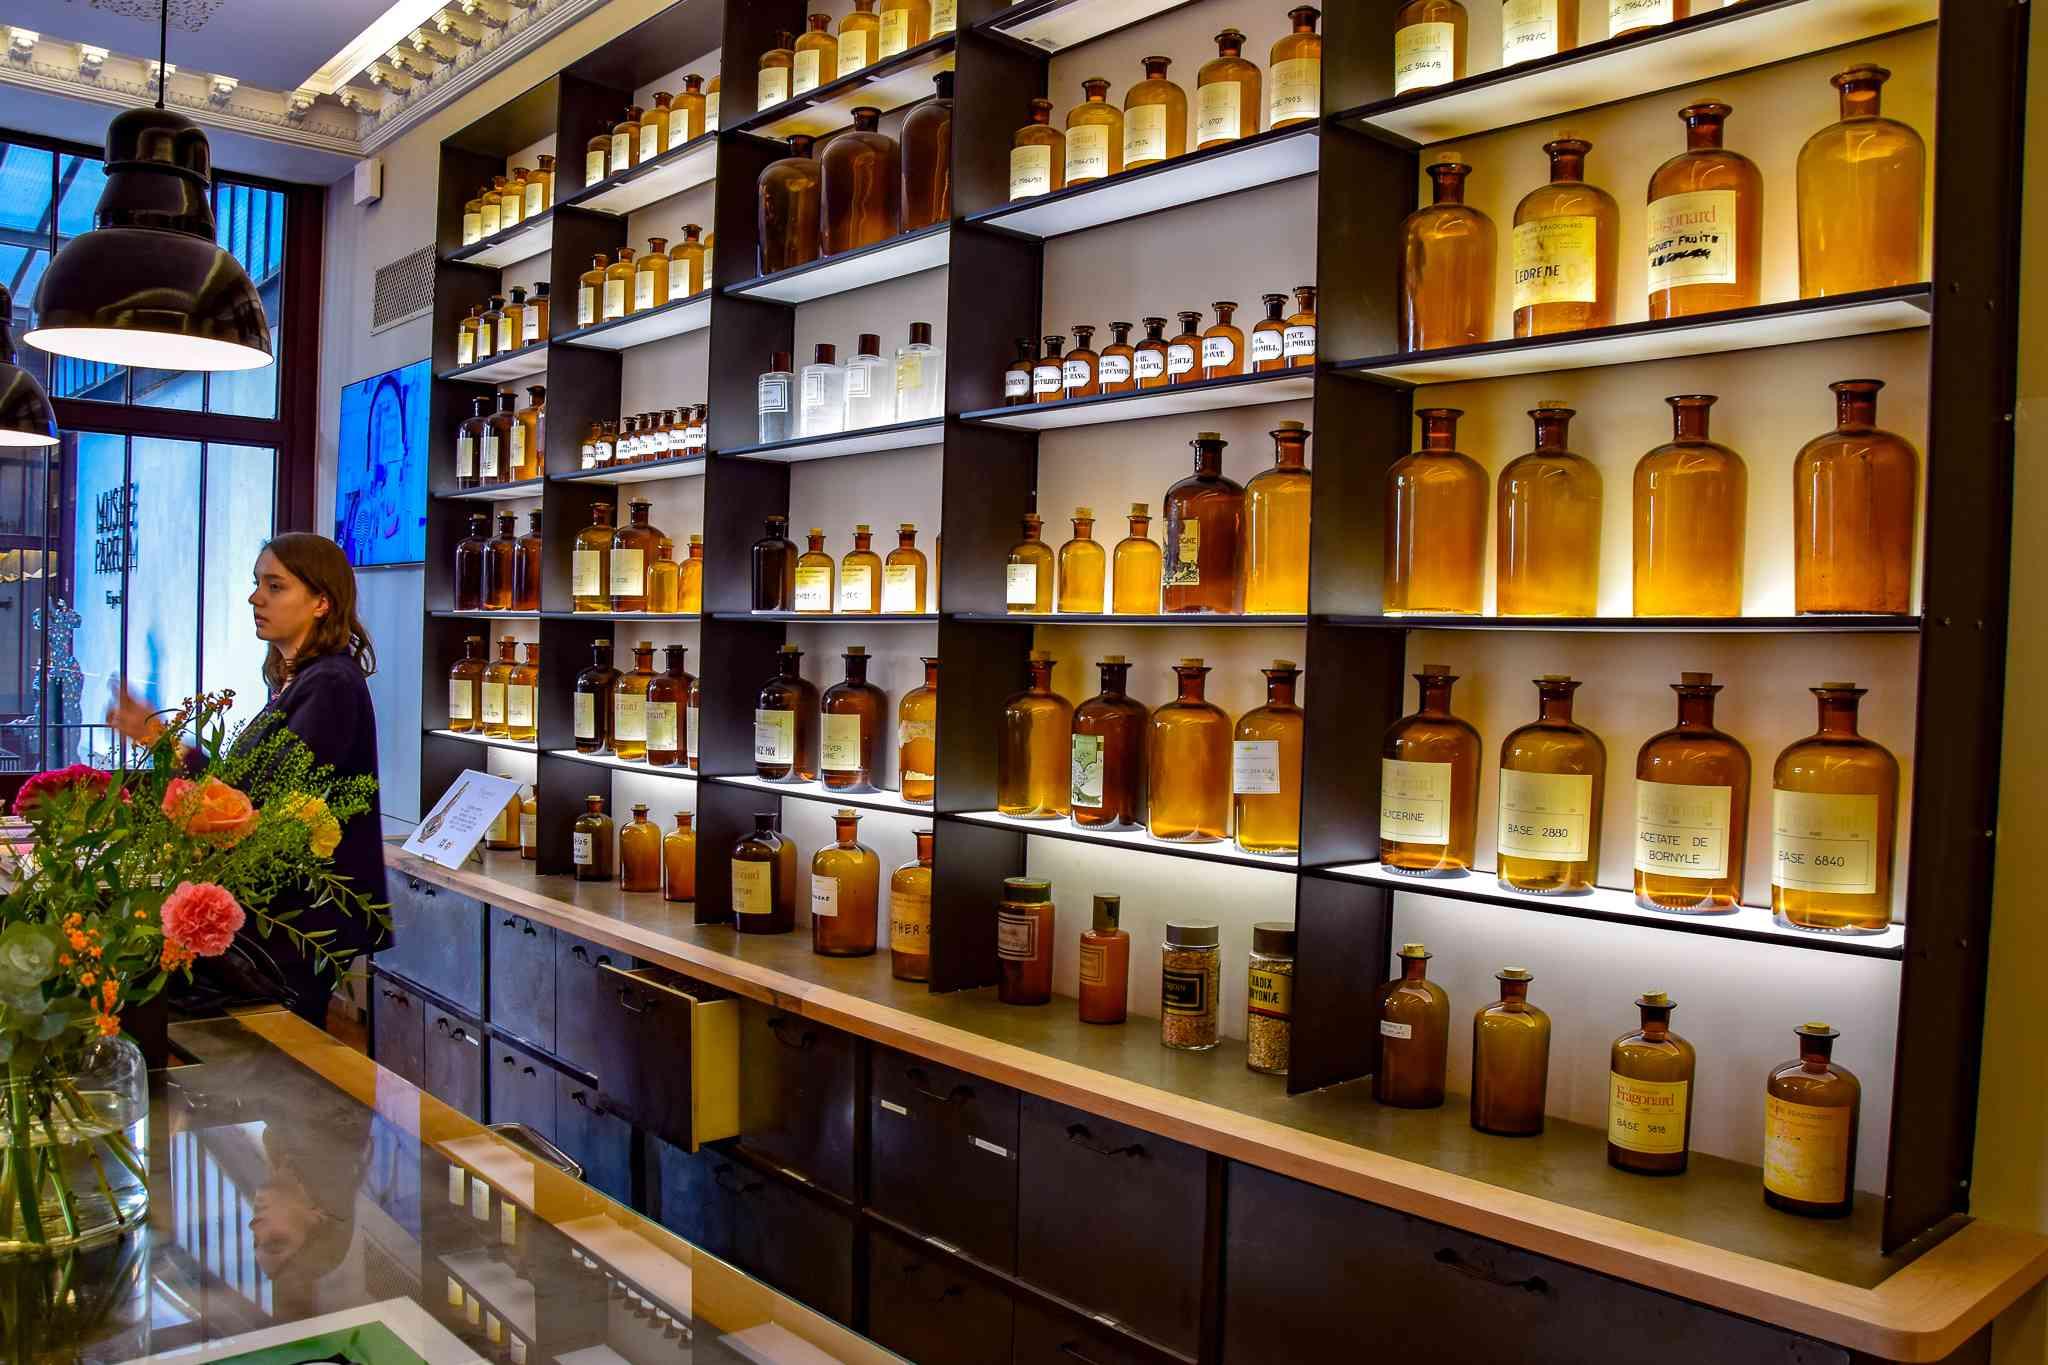 Fragonard Perfume Museum in Paris, France